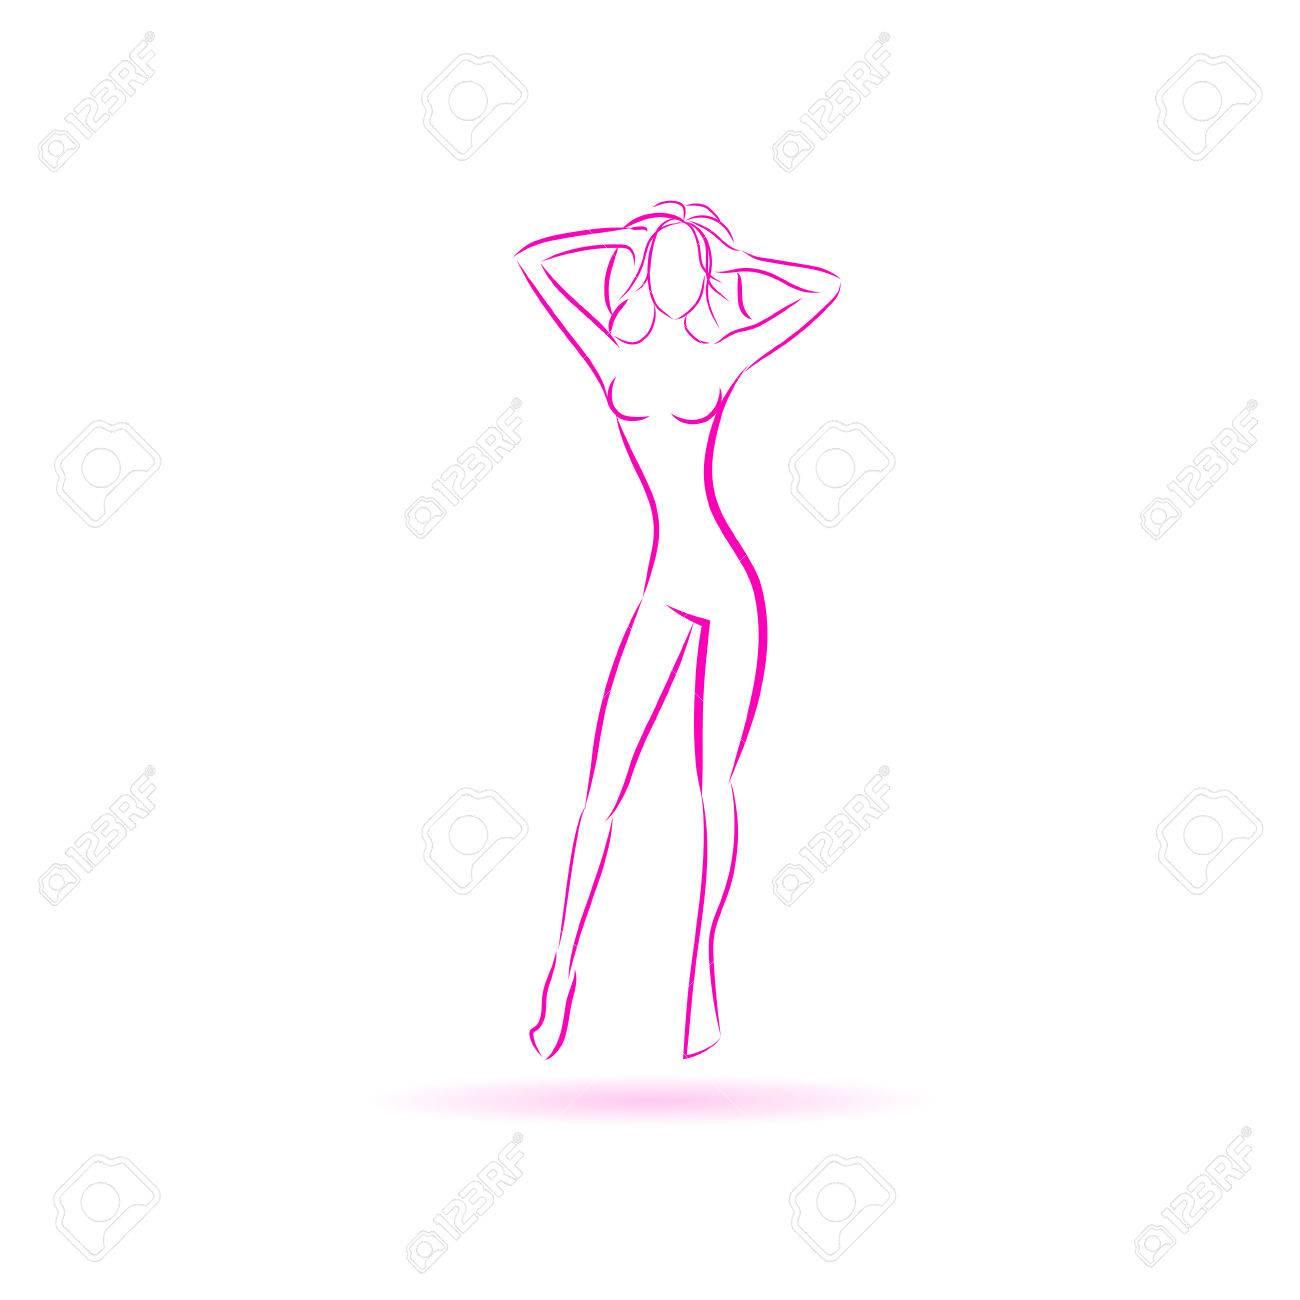 Weiblicher Körper-Logo-Rosa-Symbol Vector Illustration Lizenzfrei ...